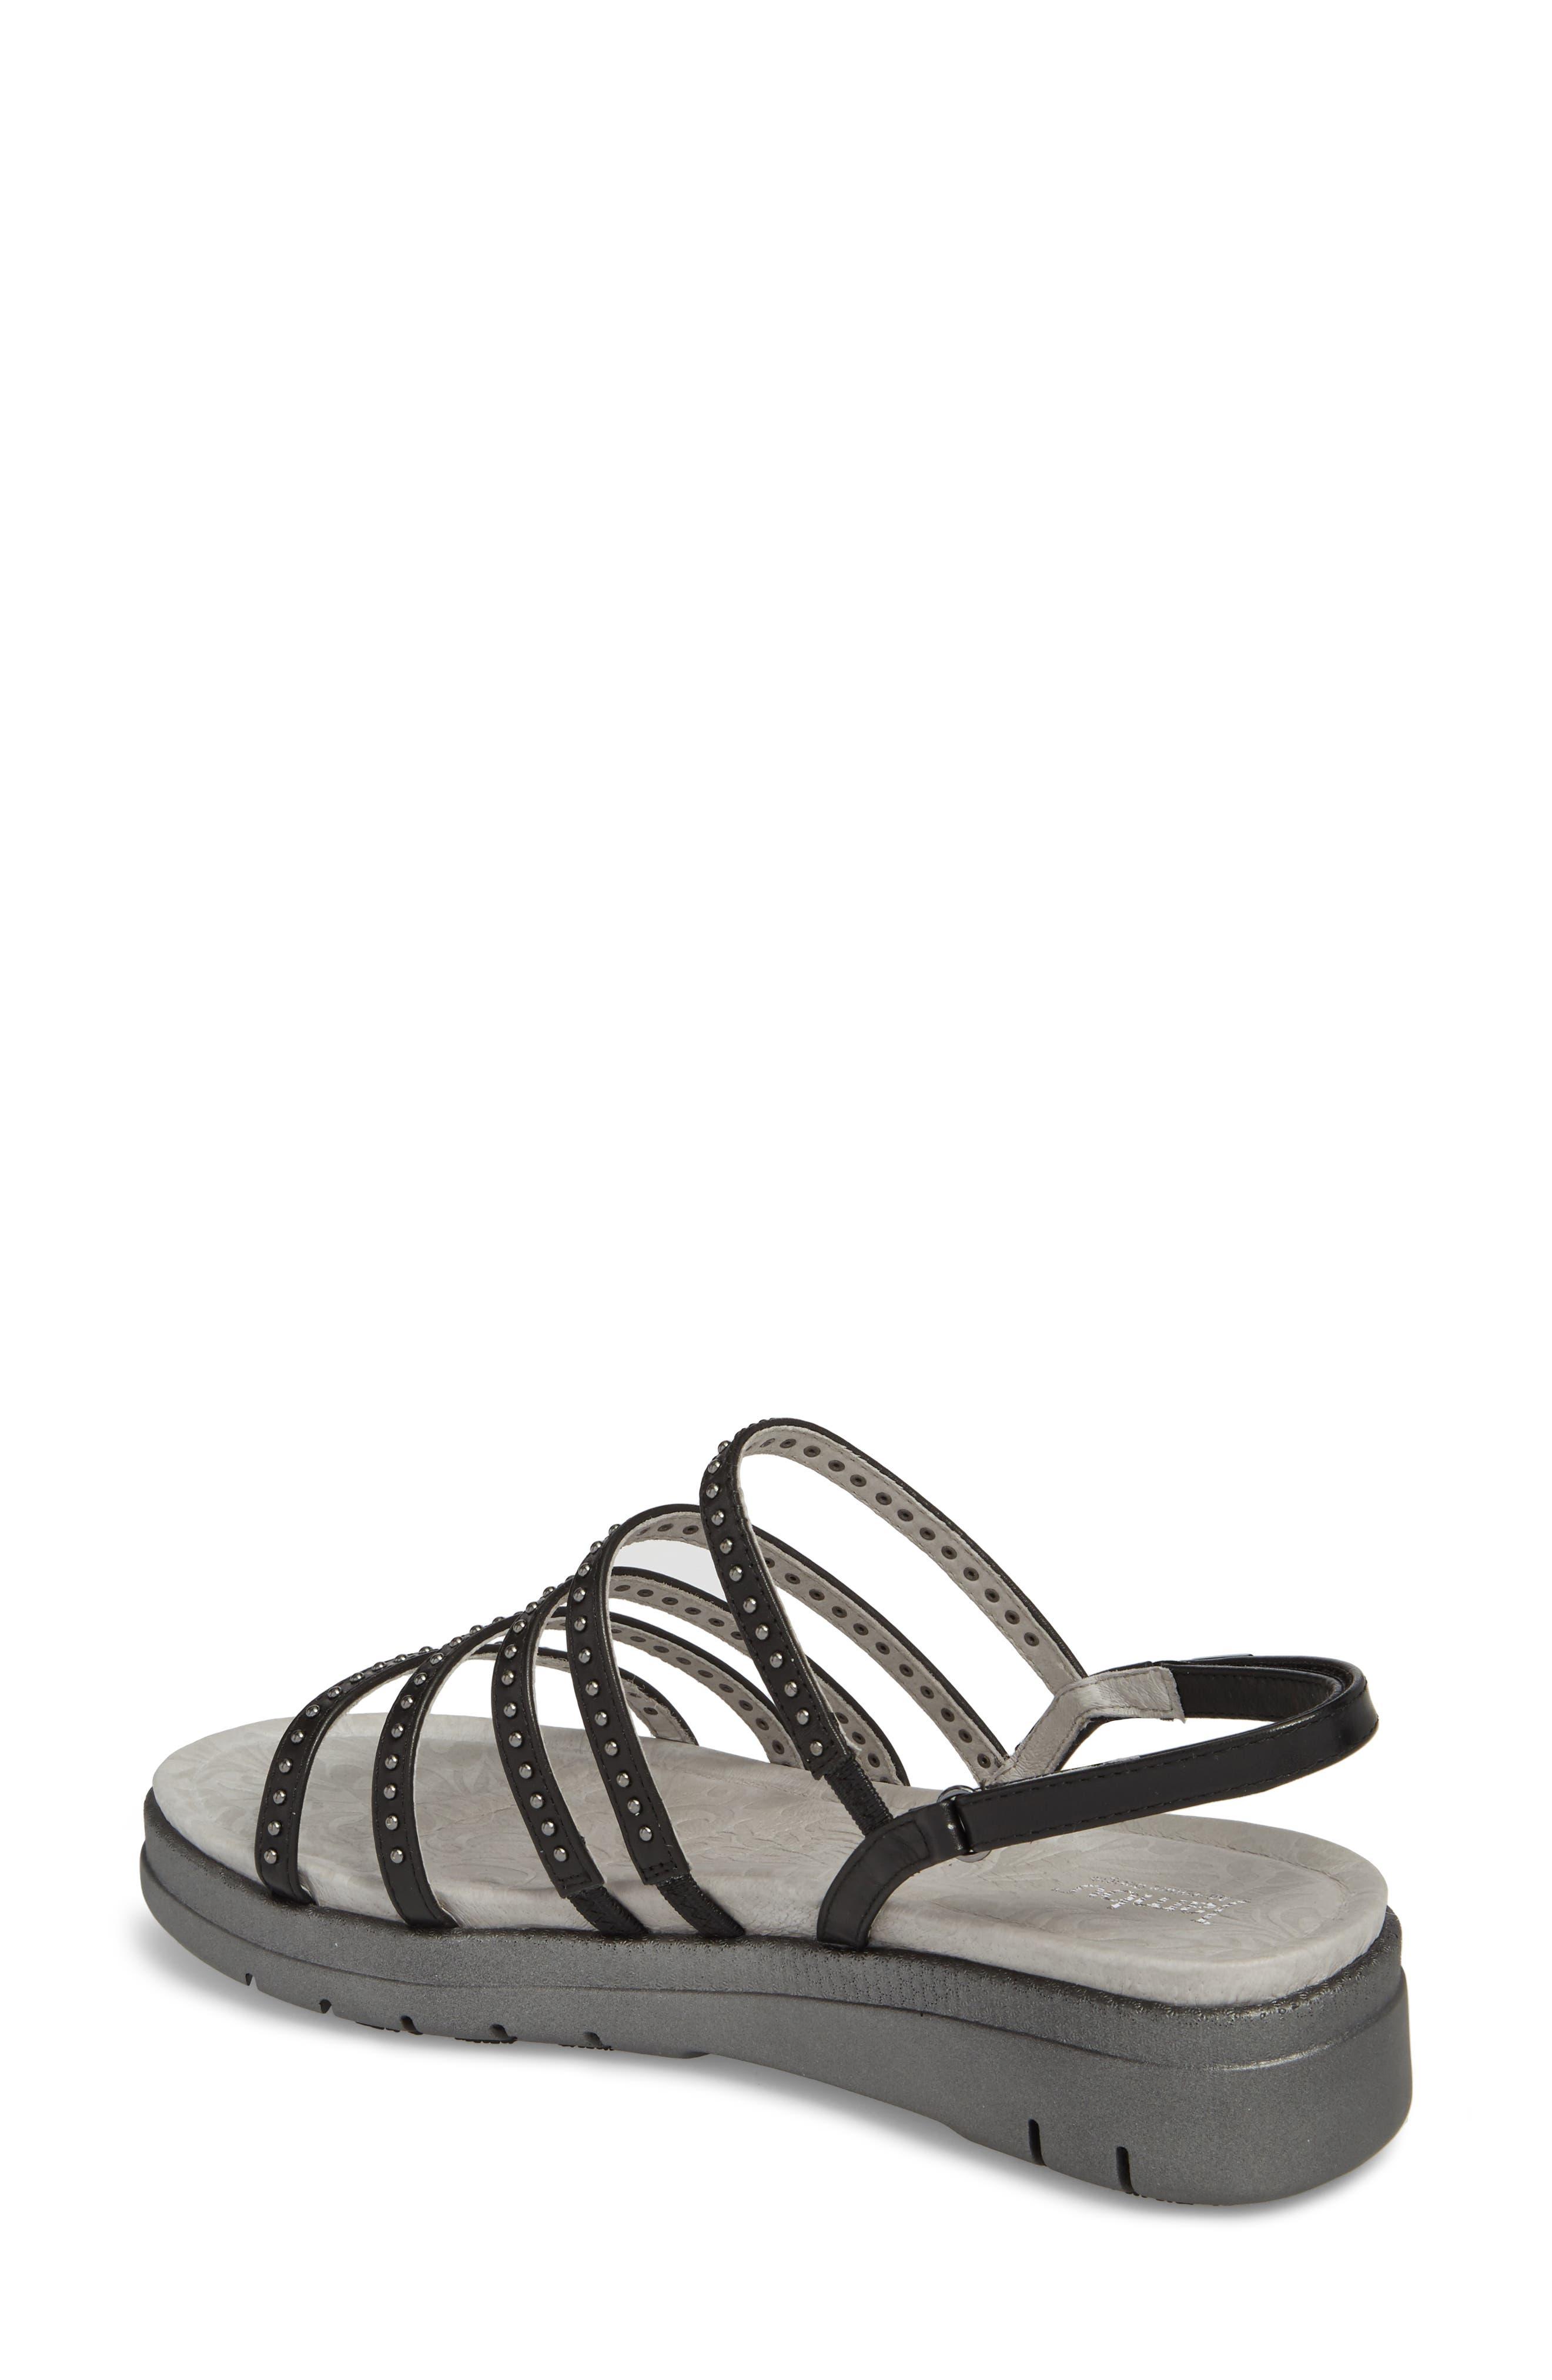 Elegance Studded Strappy Sandal,                             Alternate thumbnail 2, color,                             BLACK LEATHER